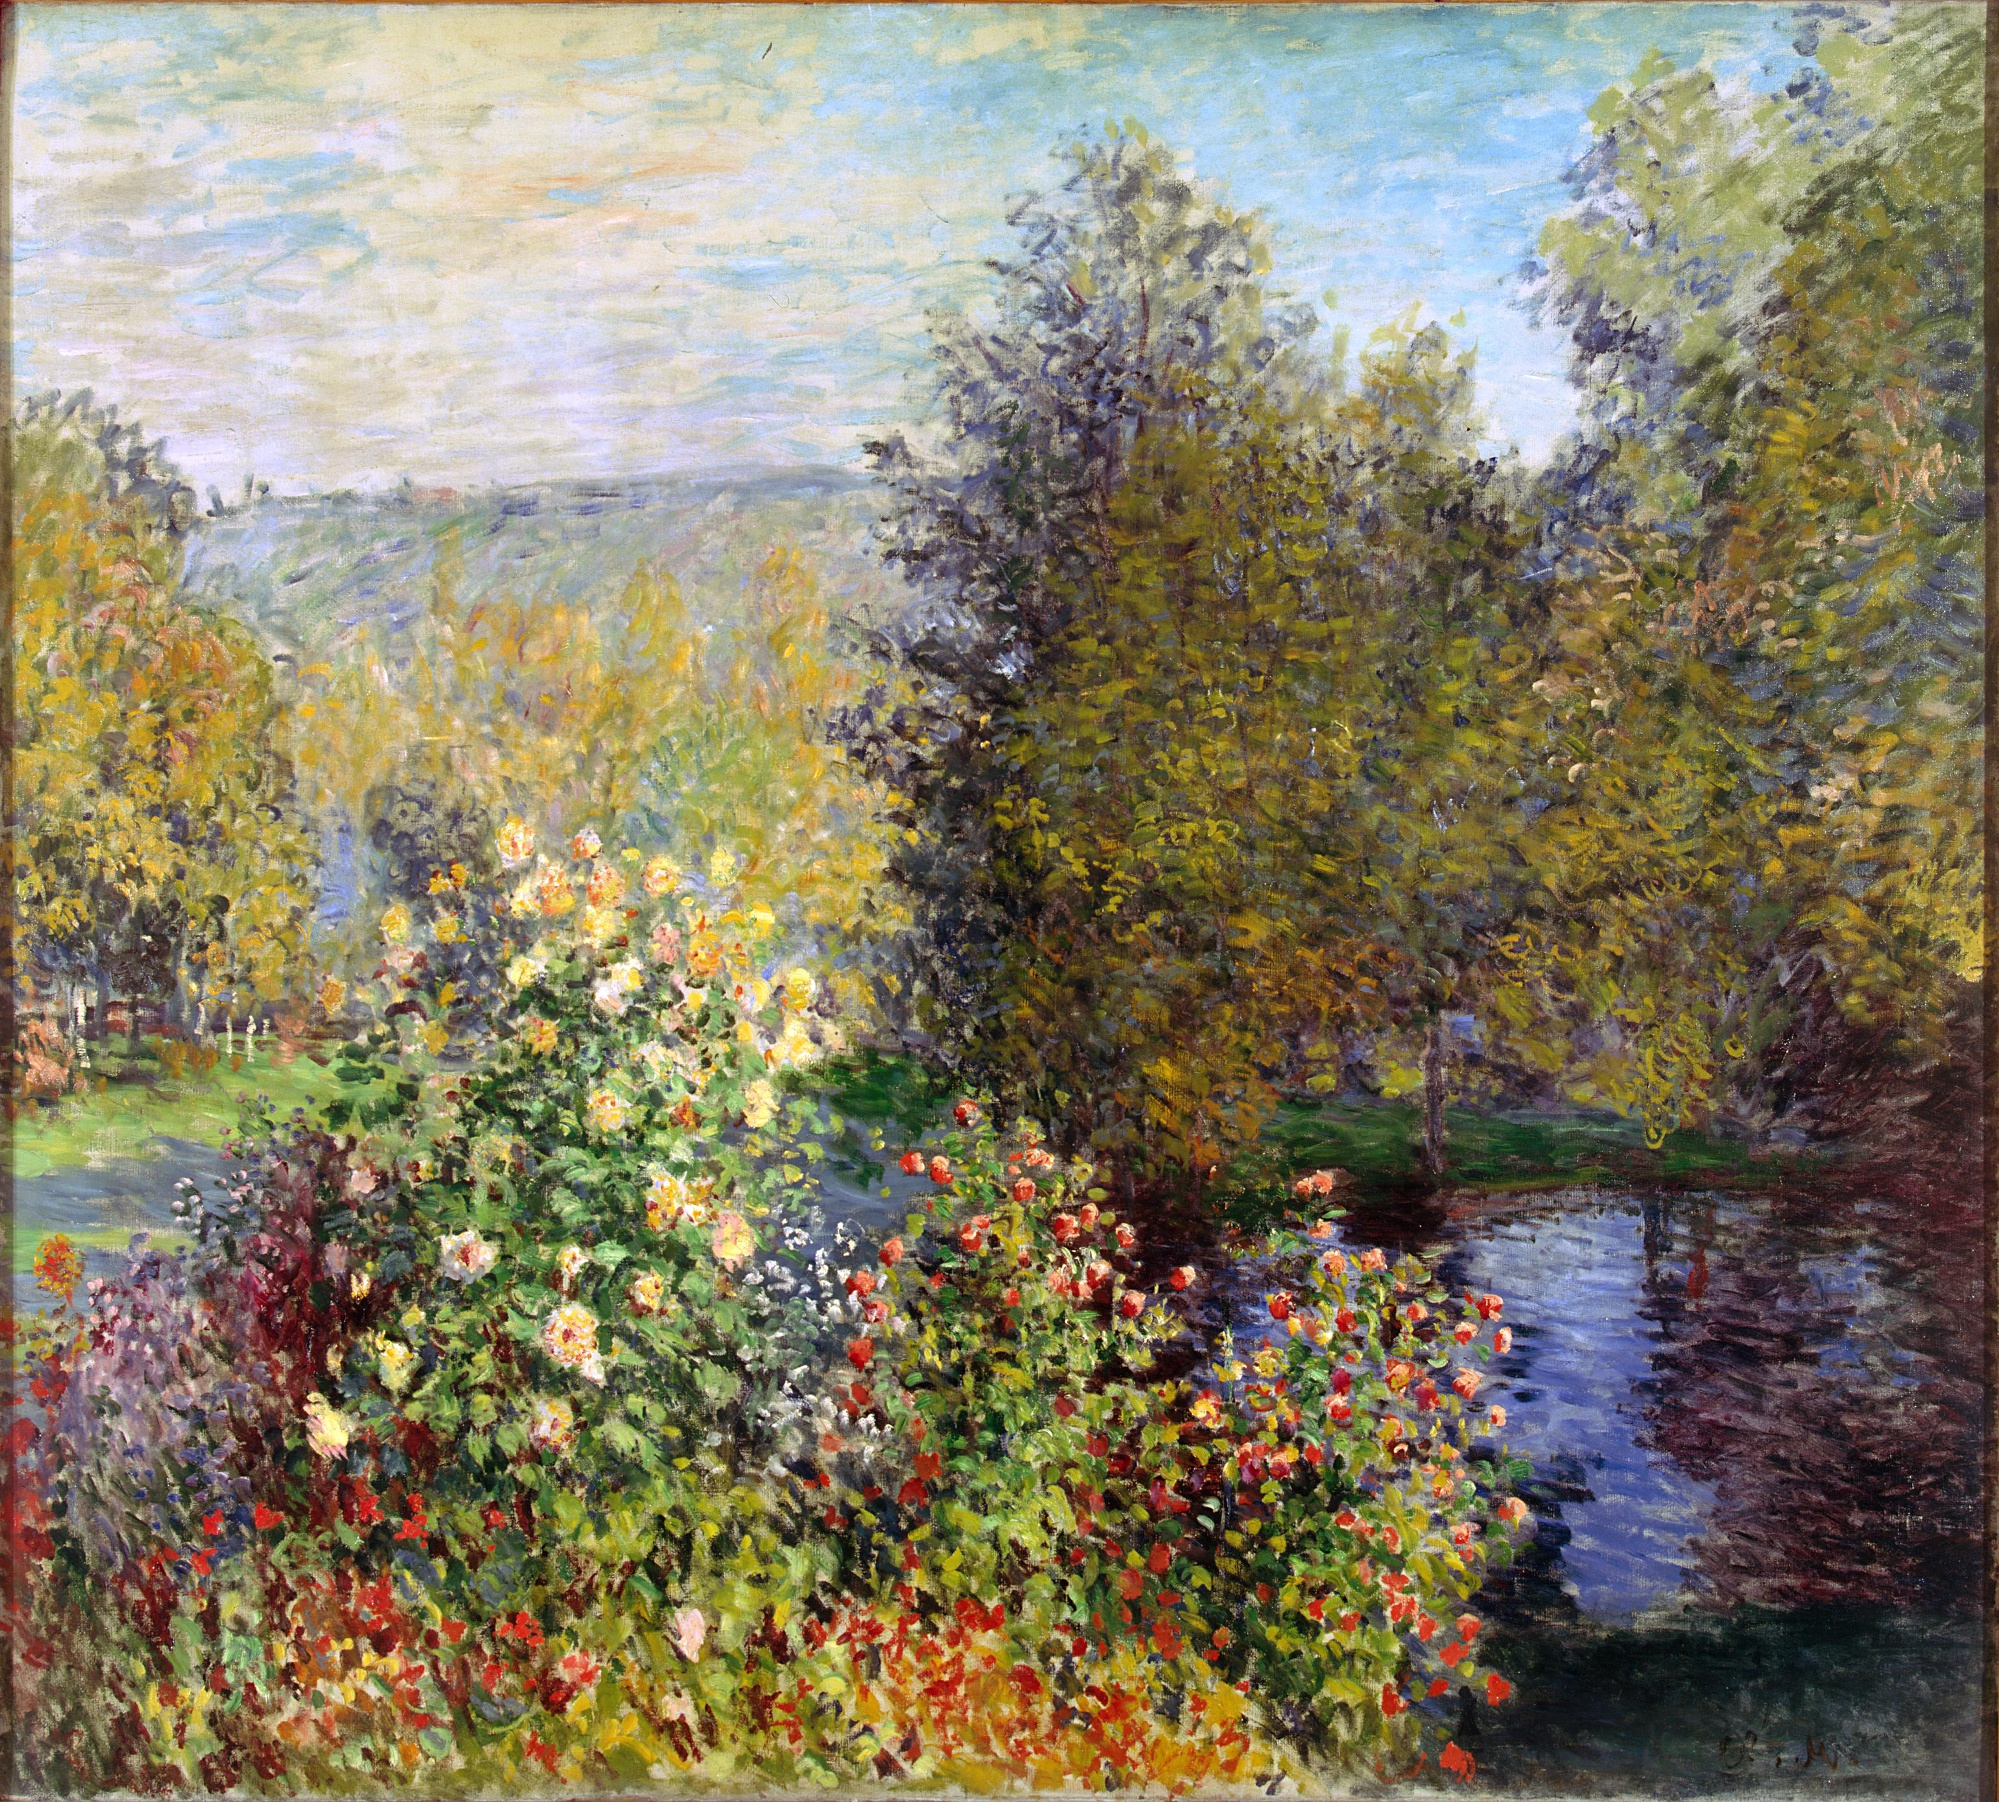 пейзаж < Сад в Монжироне >:: Клод Моне, описание картины - Моне Клод (Claude Monet) фото